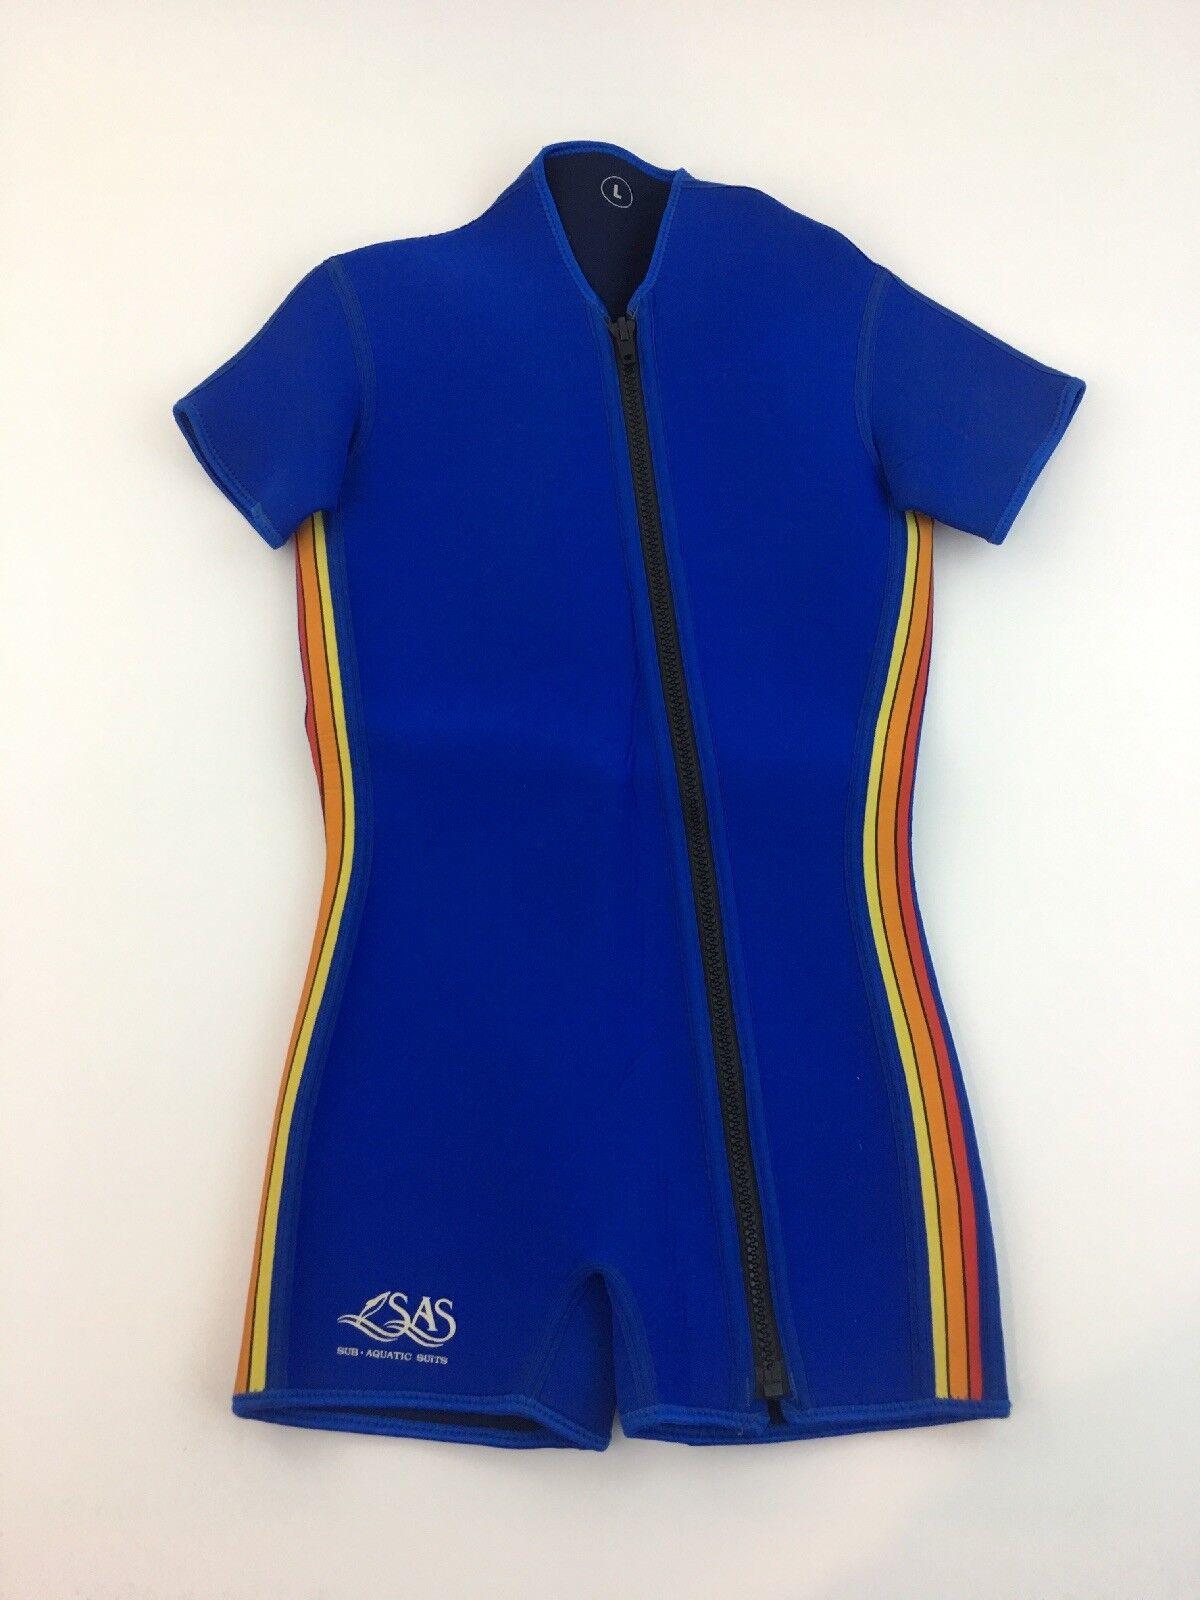 SAS Sub Aquatic Suits Neoprene WET SUIT Men's   LARGE  cheaper prices